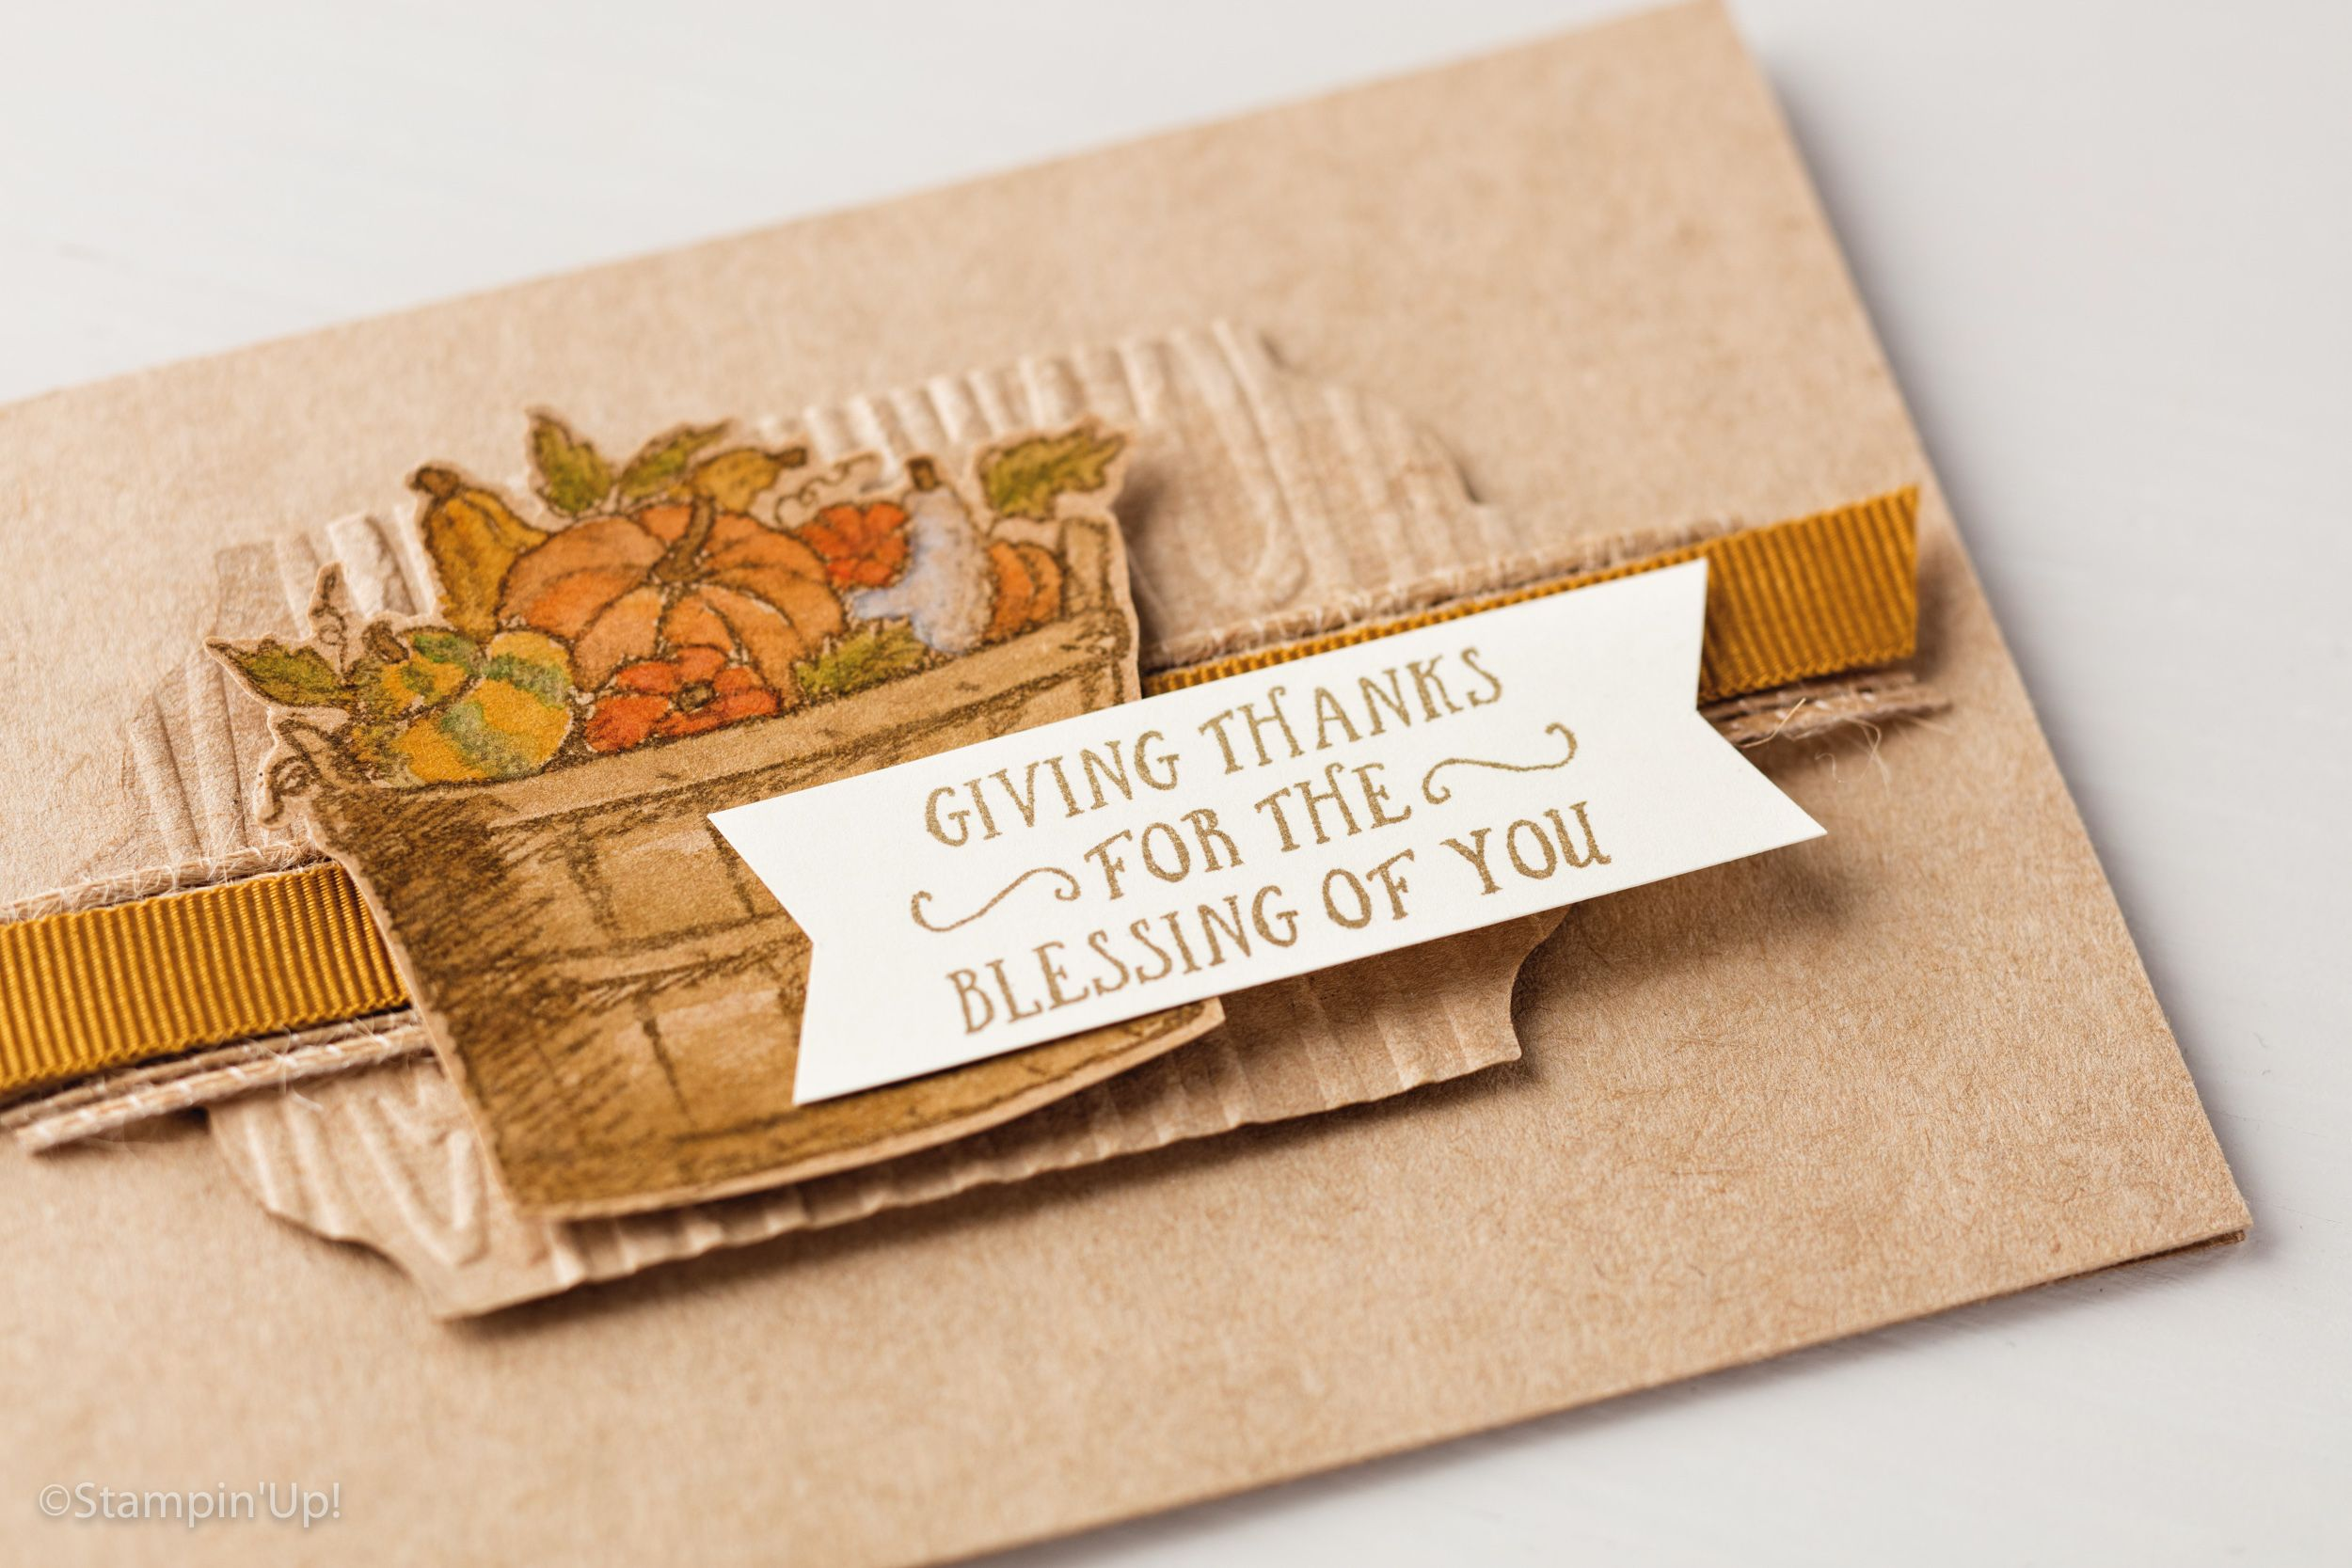 Thankful harvest basket of blessings Thanksgiving card